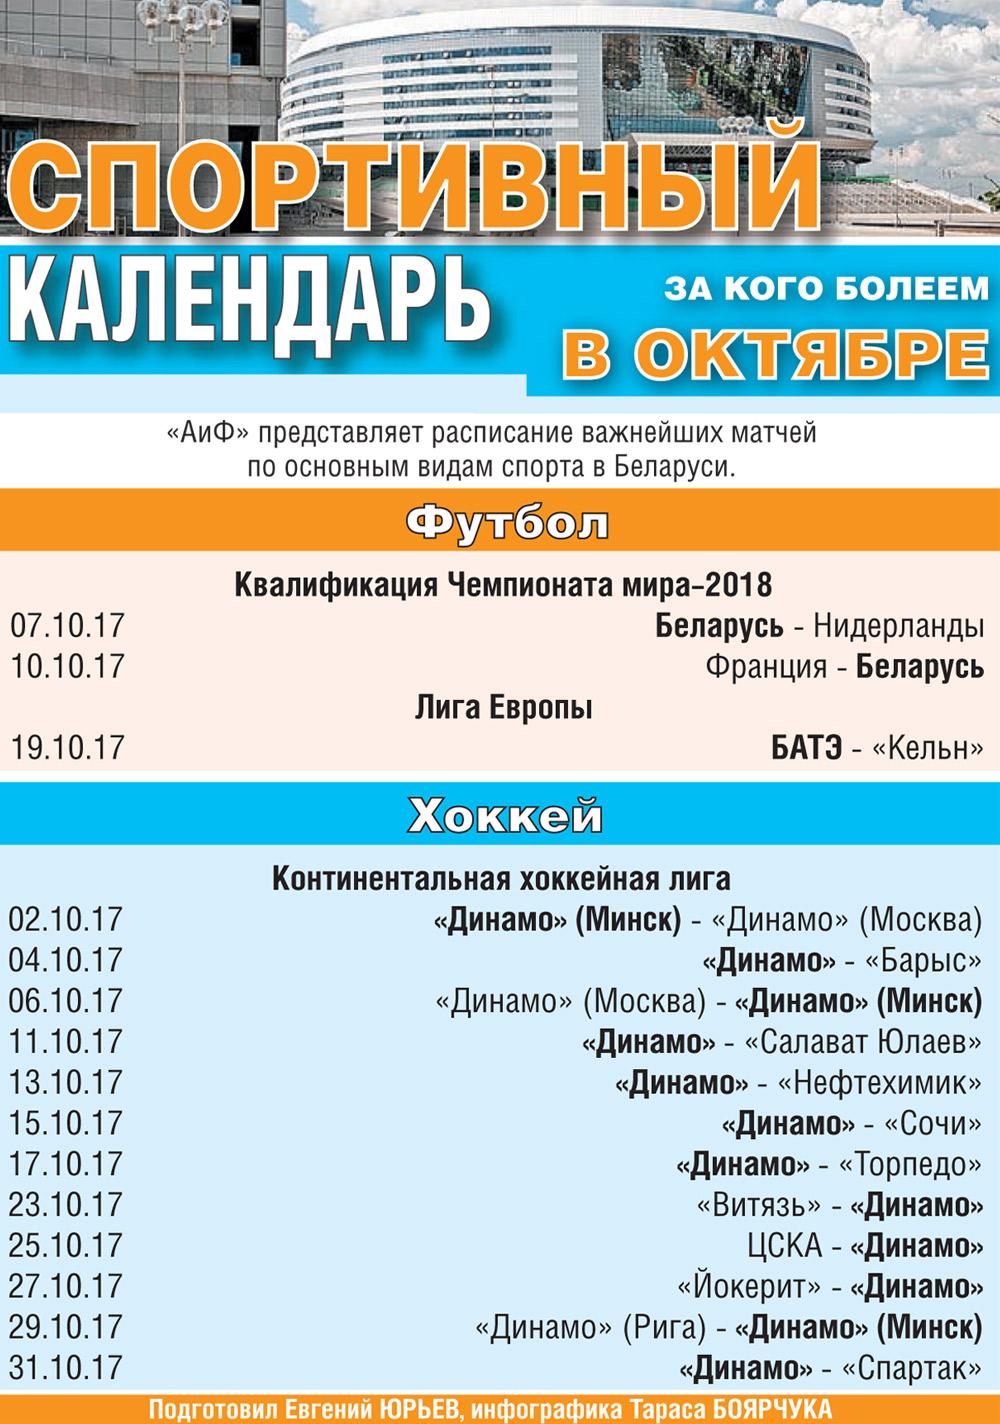 Спортивный календарь. За кого более в апреле. Инфографика АиФ/ Евгений ЮРЬЕВ, Тарас БОЯРЧУК.